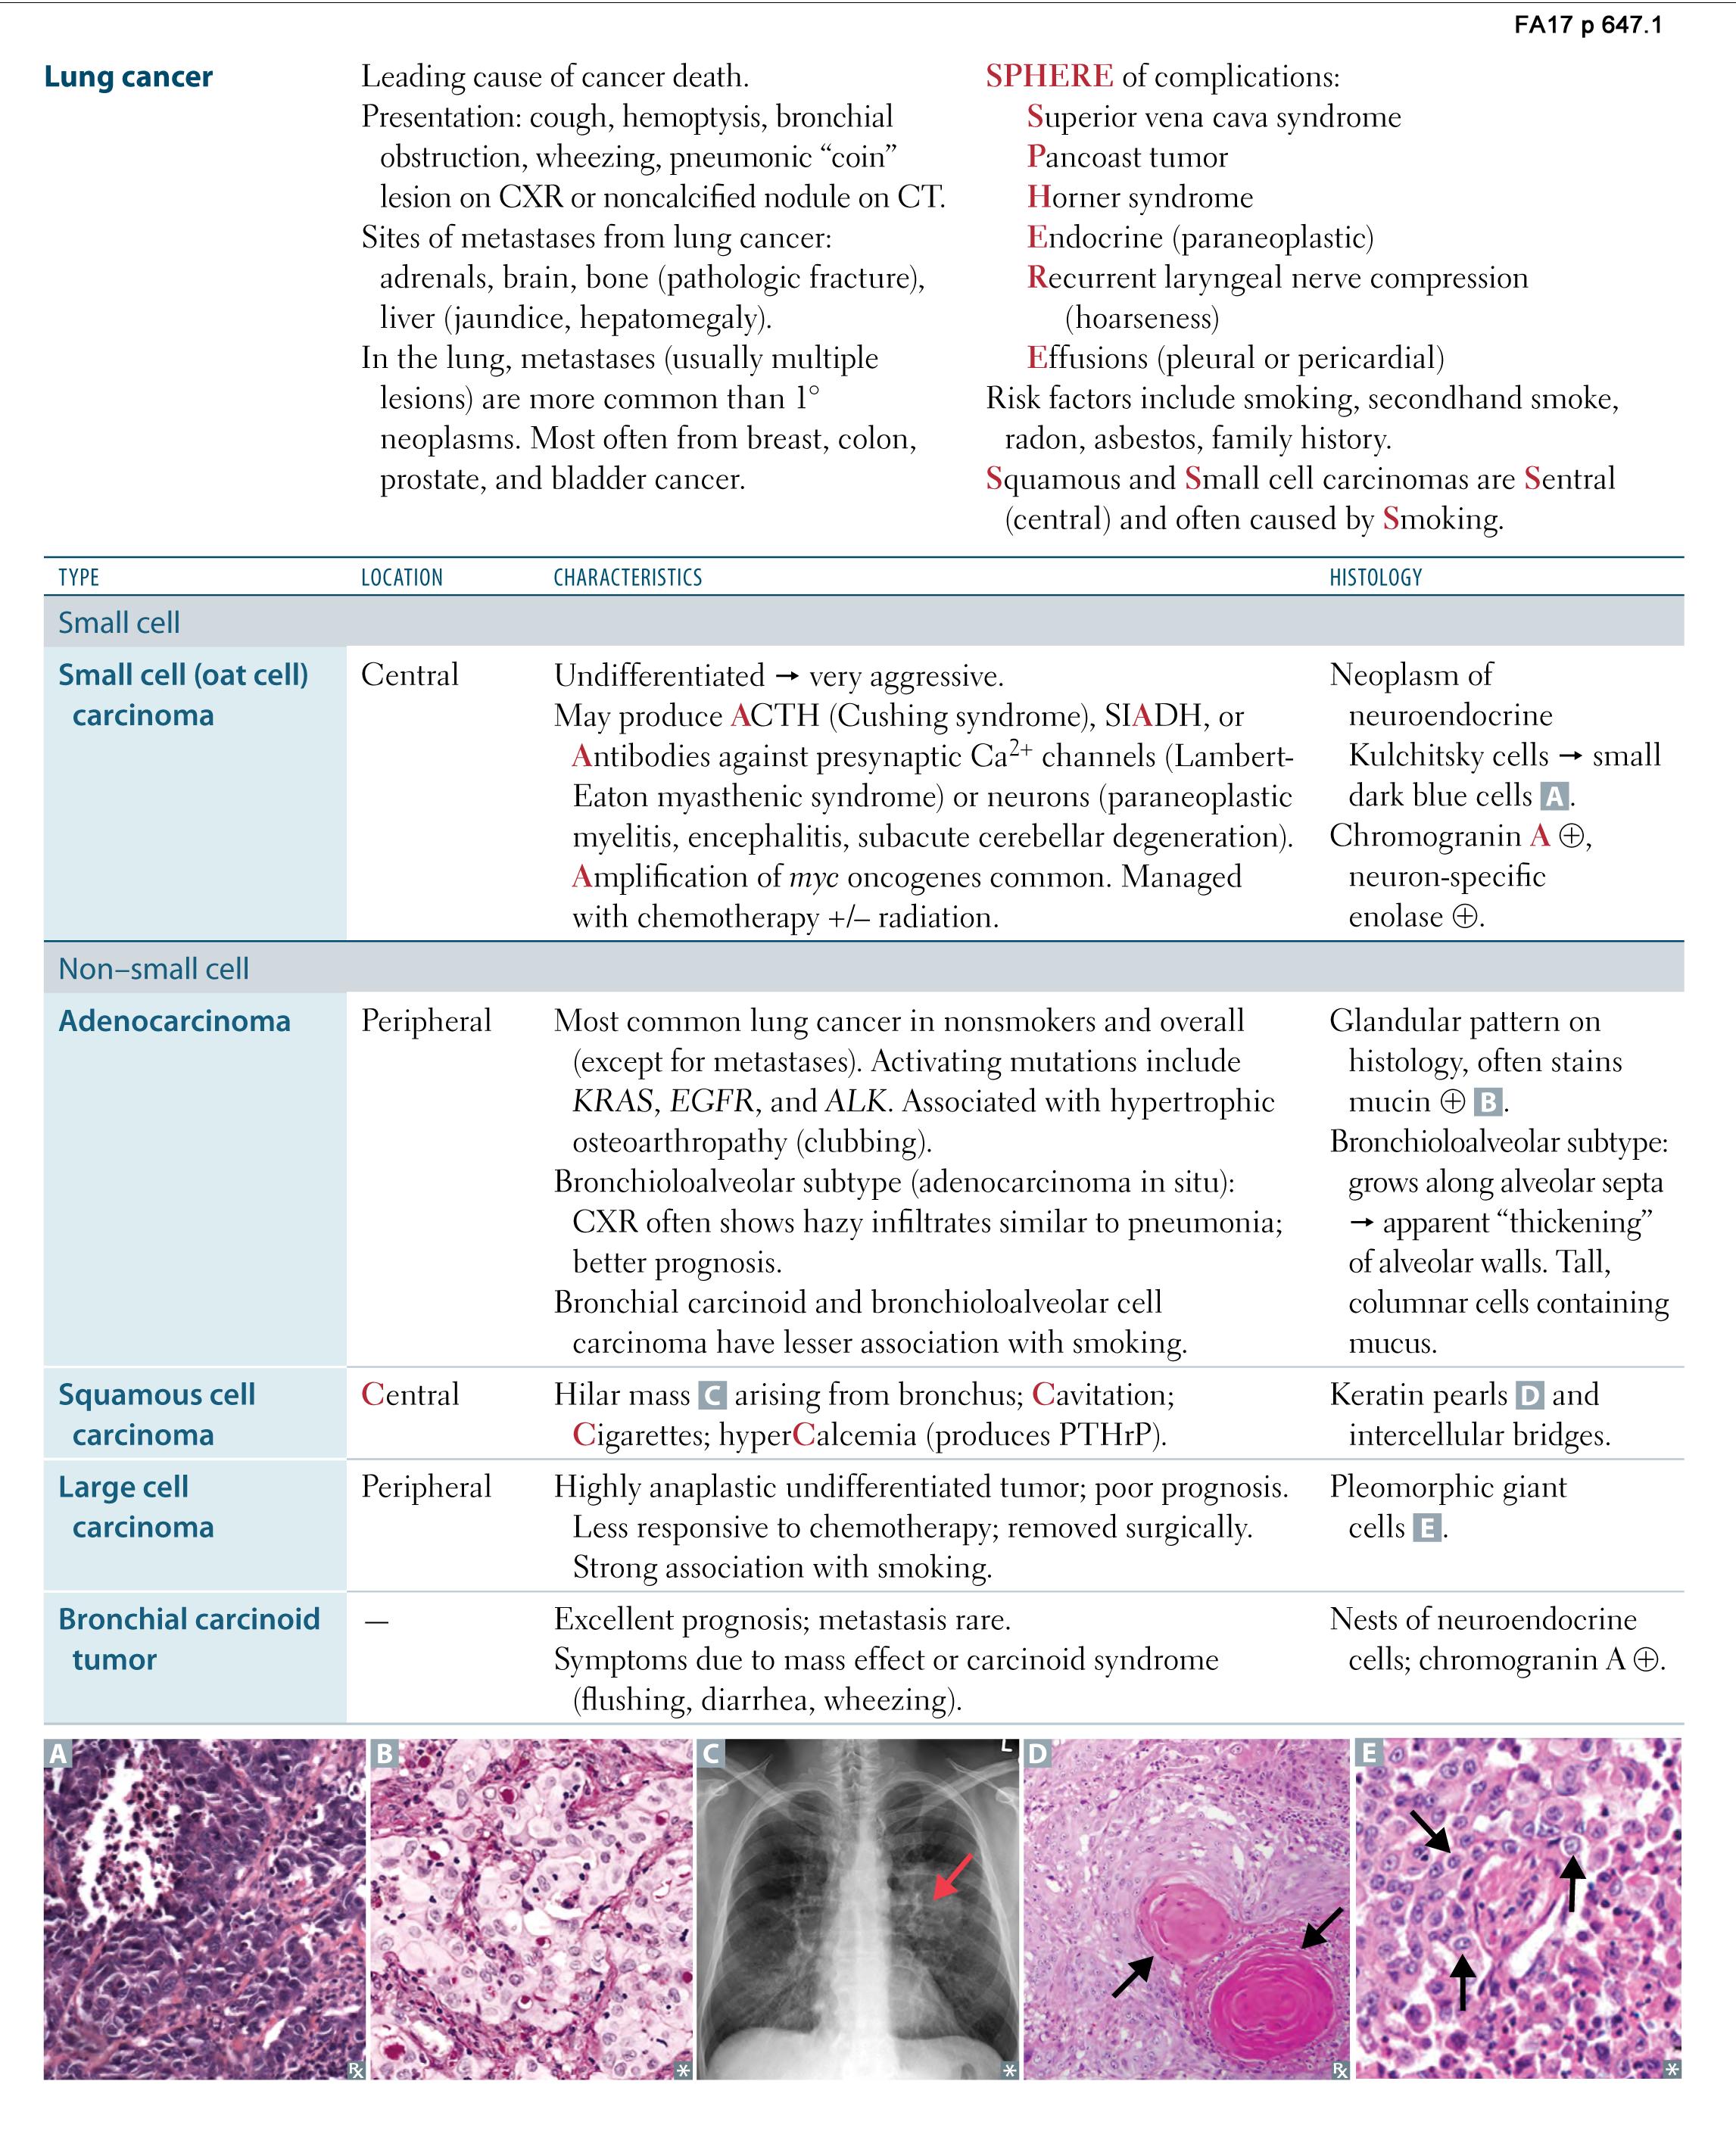 Respiratory Pathology Lung Cancer Usmle Rx 2017 Respiratory Pathology Lung Cancer Flashcards Memorang